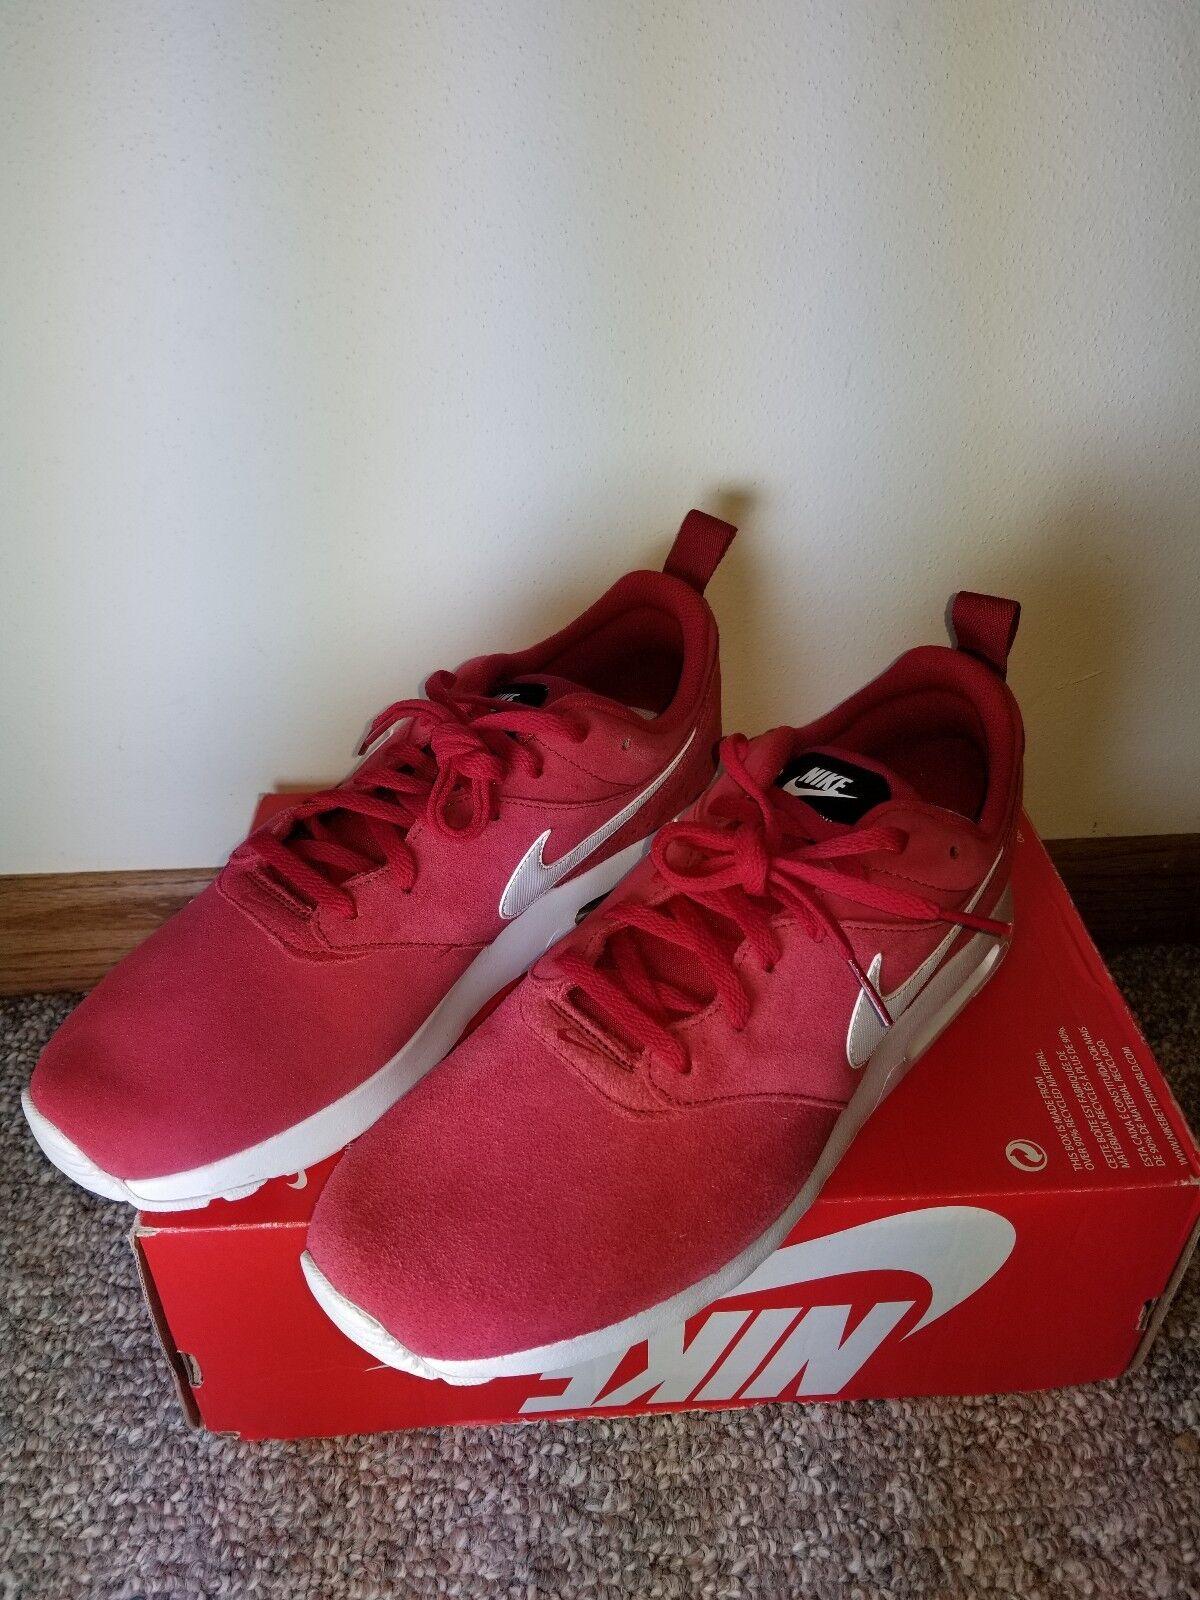 Nuevo Nike Air Max Tavas Rojo LTR Tamaño Hombre Zapatos Tamaño LTR Rojo Tavas d9a194